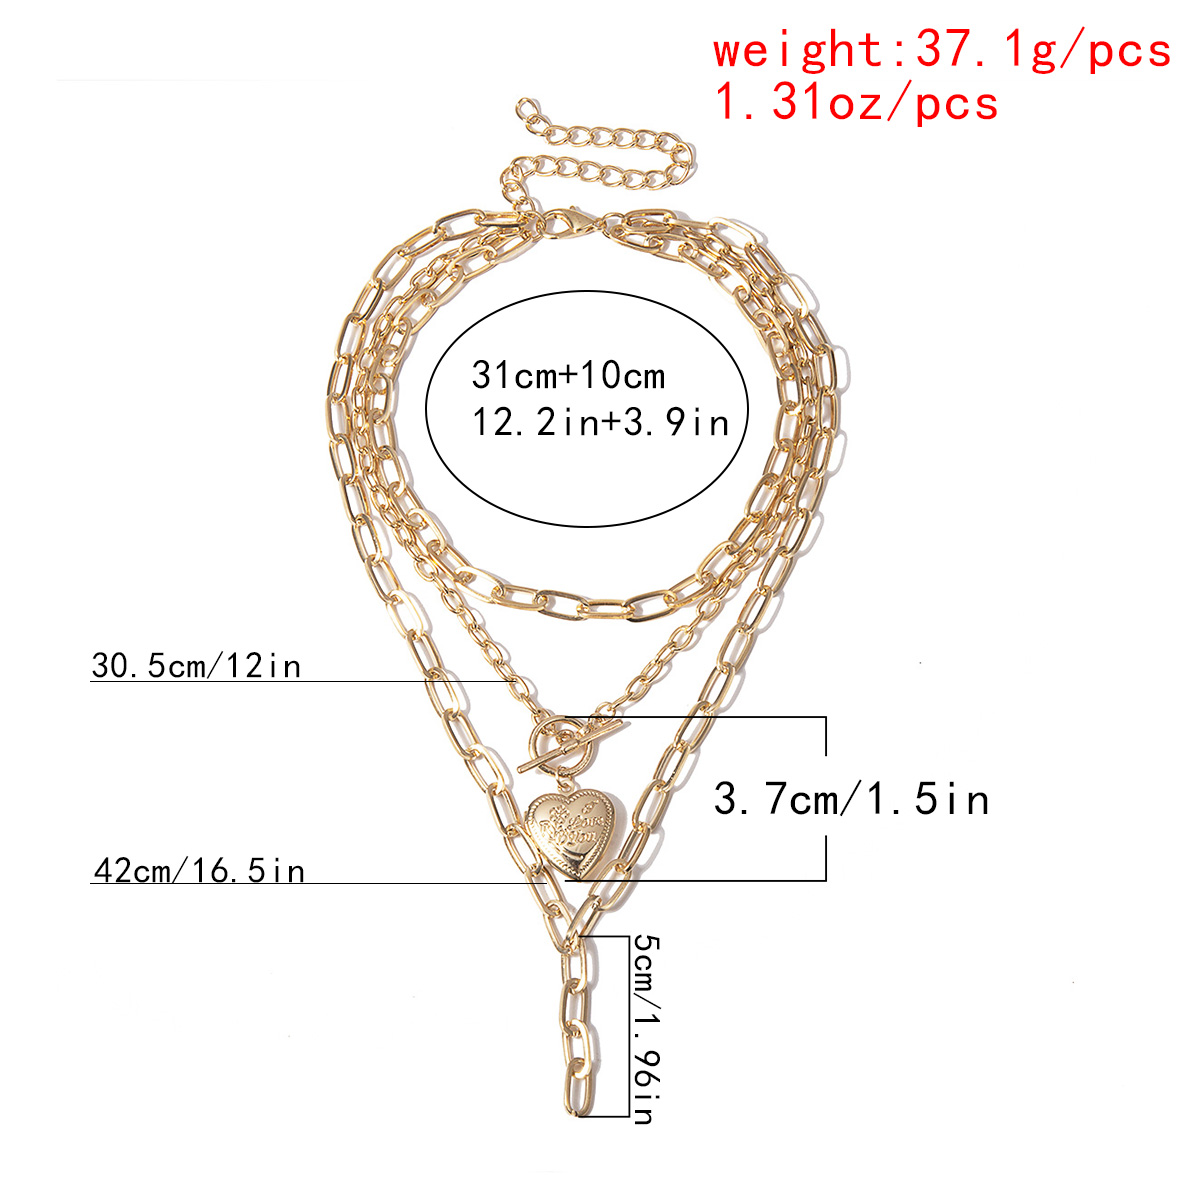 Cuban Heart Lasso Layered Necklace – BELLA Layered Necklace Necklaces 8d255f28538fbae46aeae7: color 1|color 2